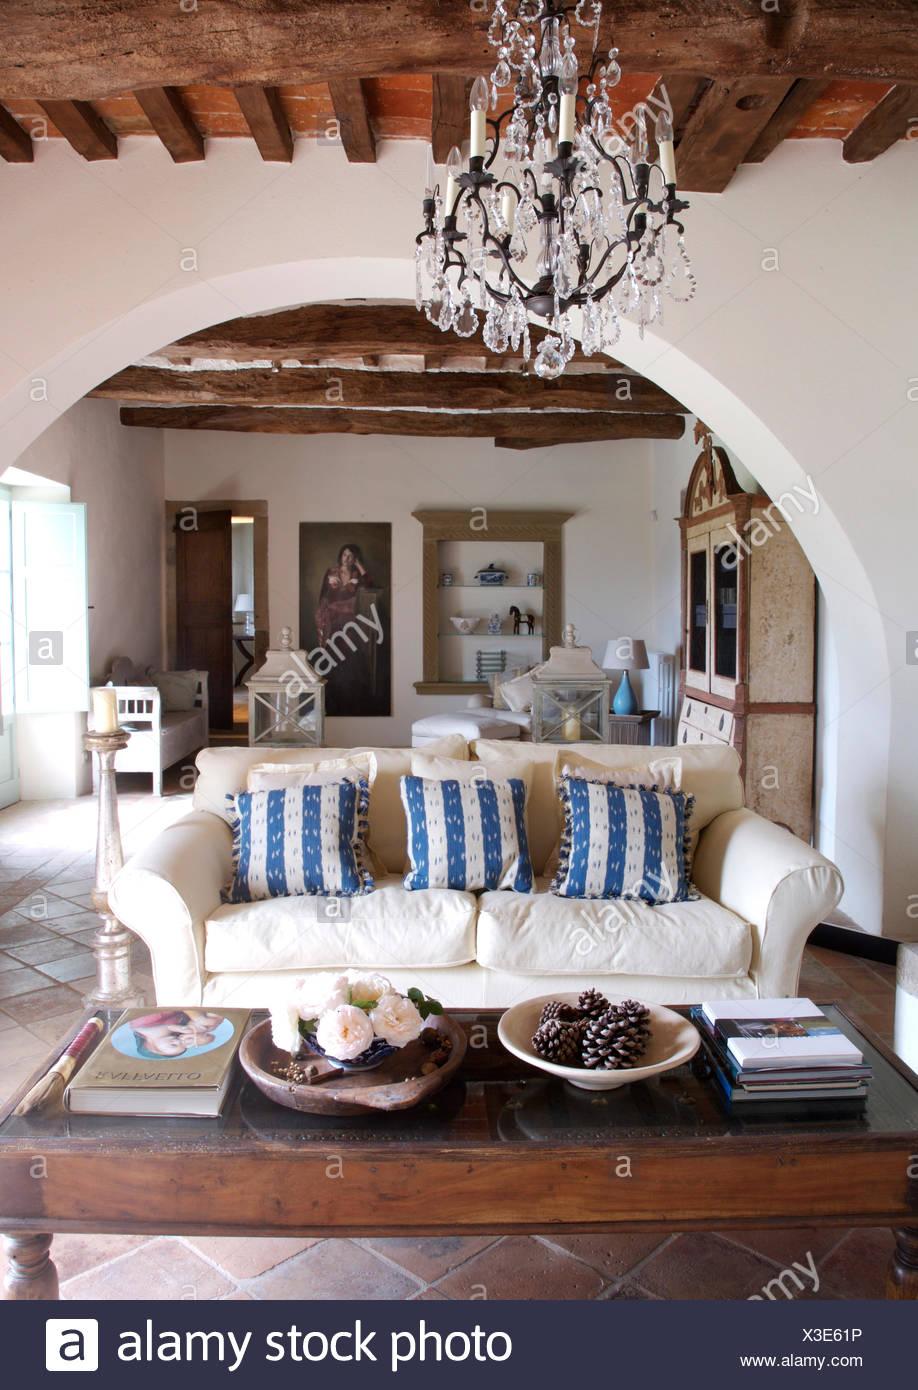 Striped Sofas Cushions Stockfotos & Striped Sofas Cushions Bilder ...